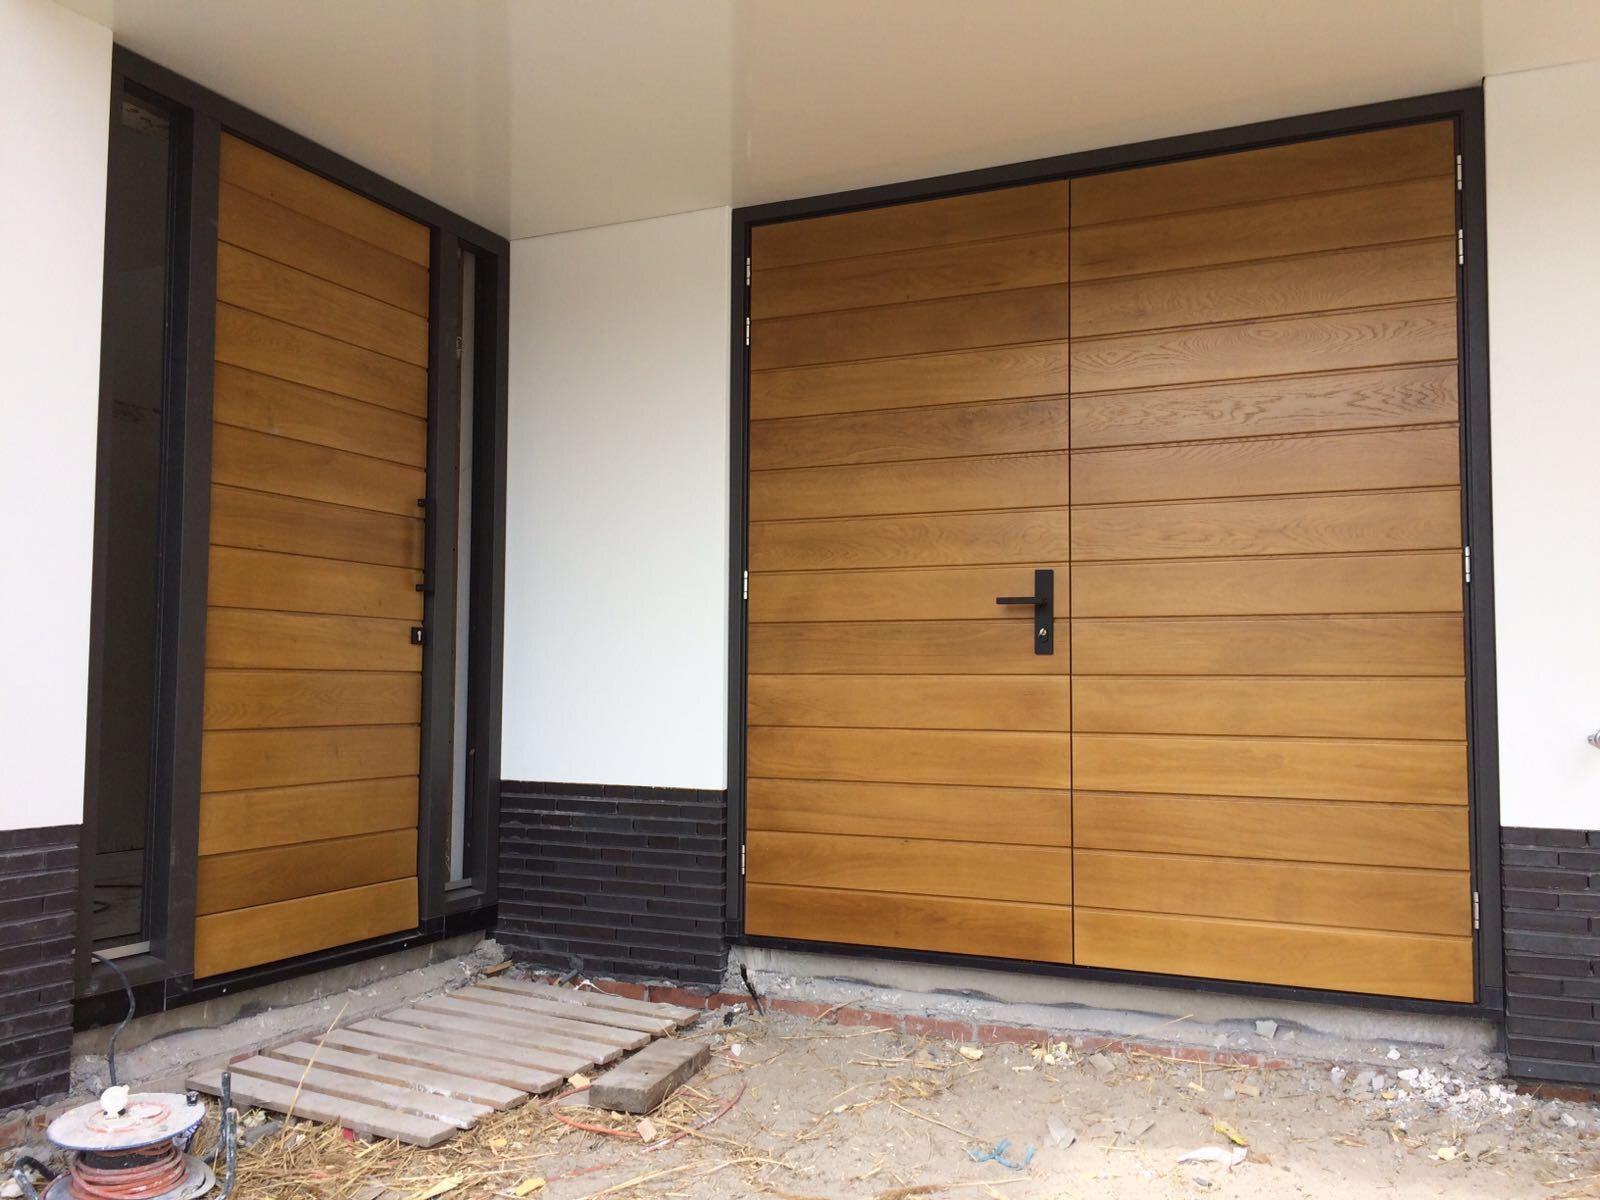 Houten openslaande garagedeur met bijpassende voordeur garage in